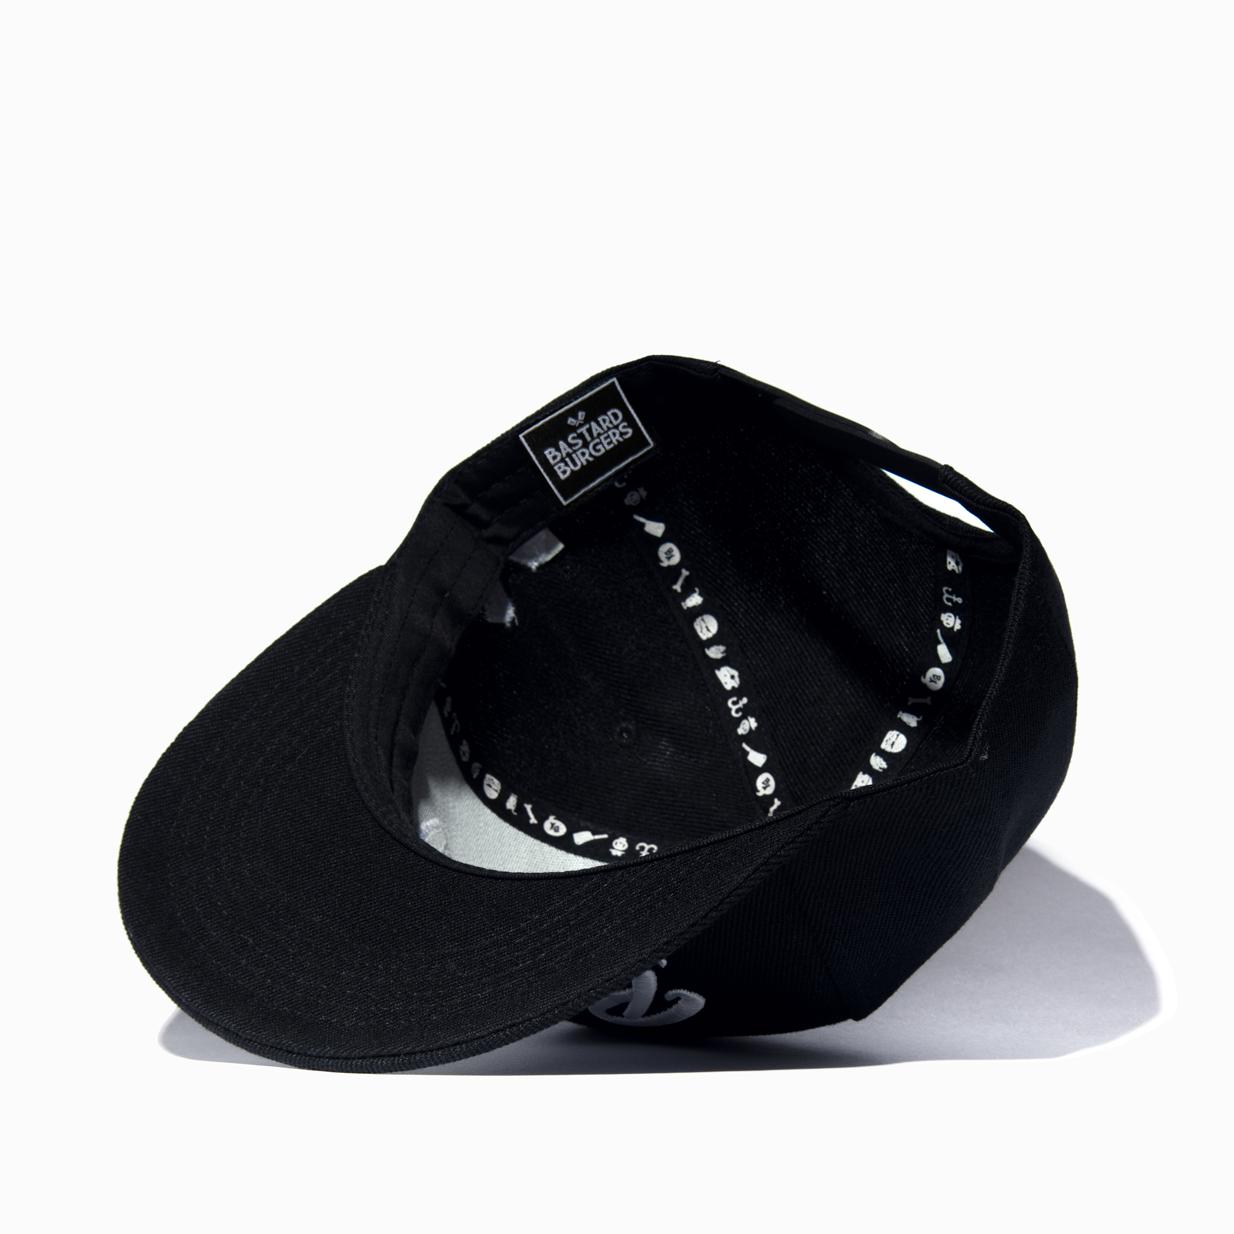 webb BLACK CAP inside